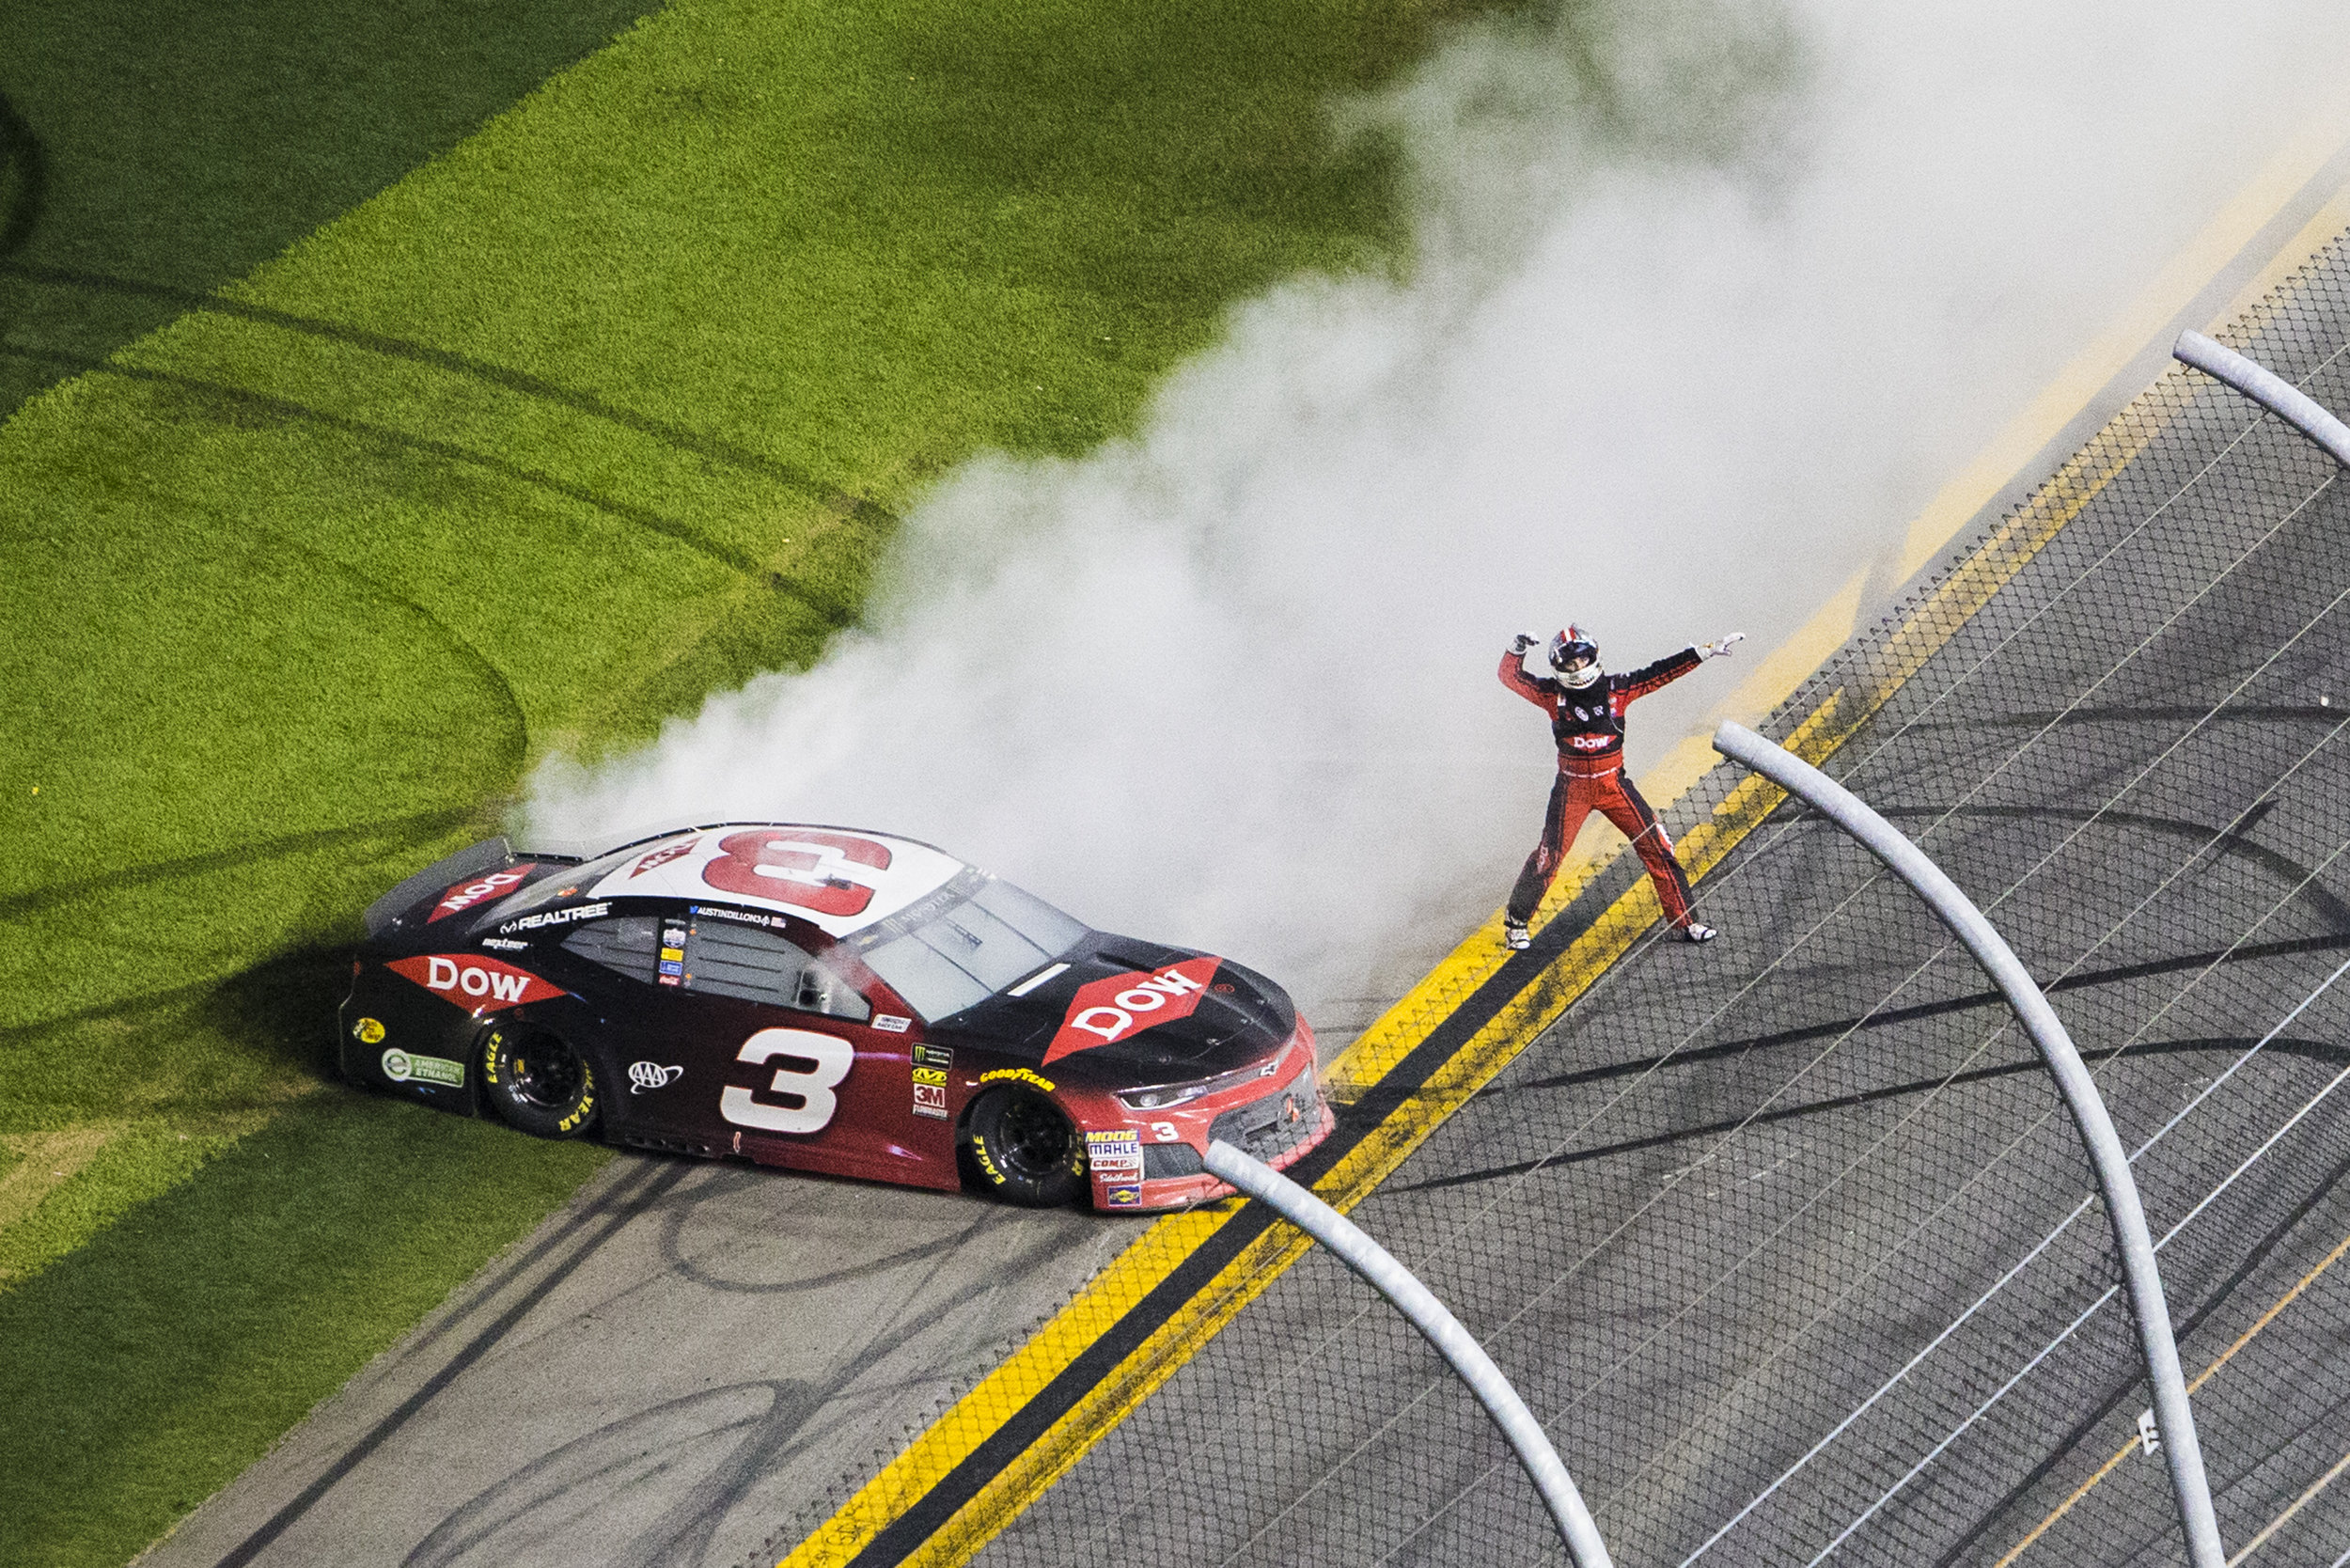 Austin Dillon celebrates his first Daytona 500 victory in the #3 Car.